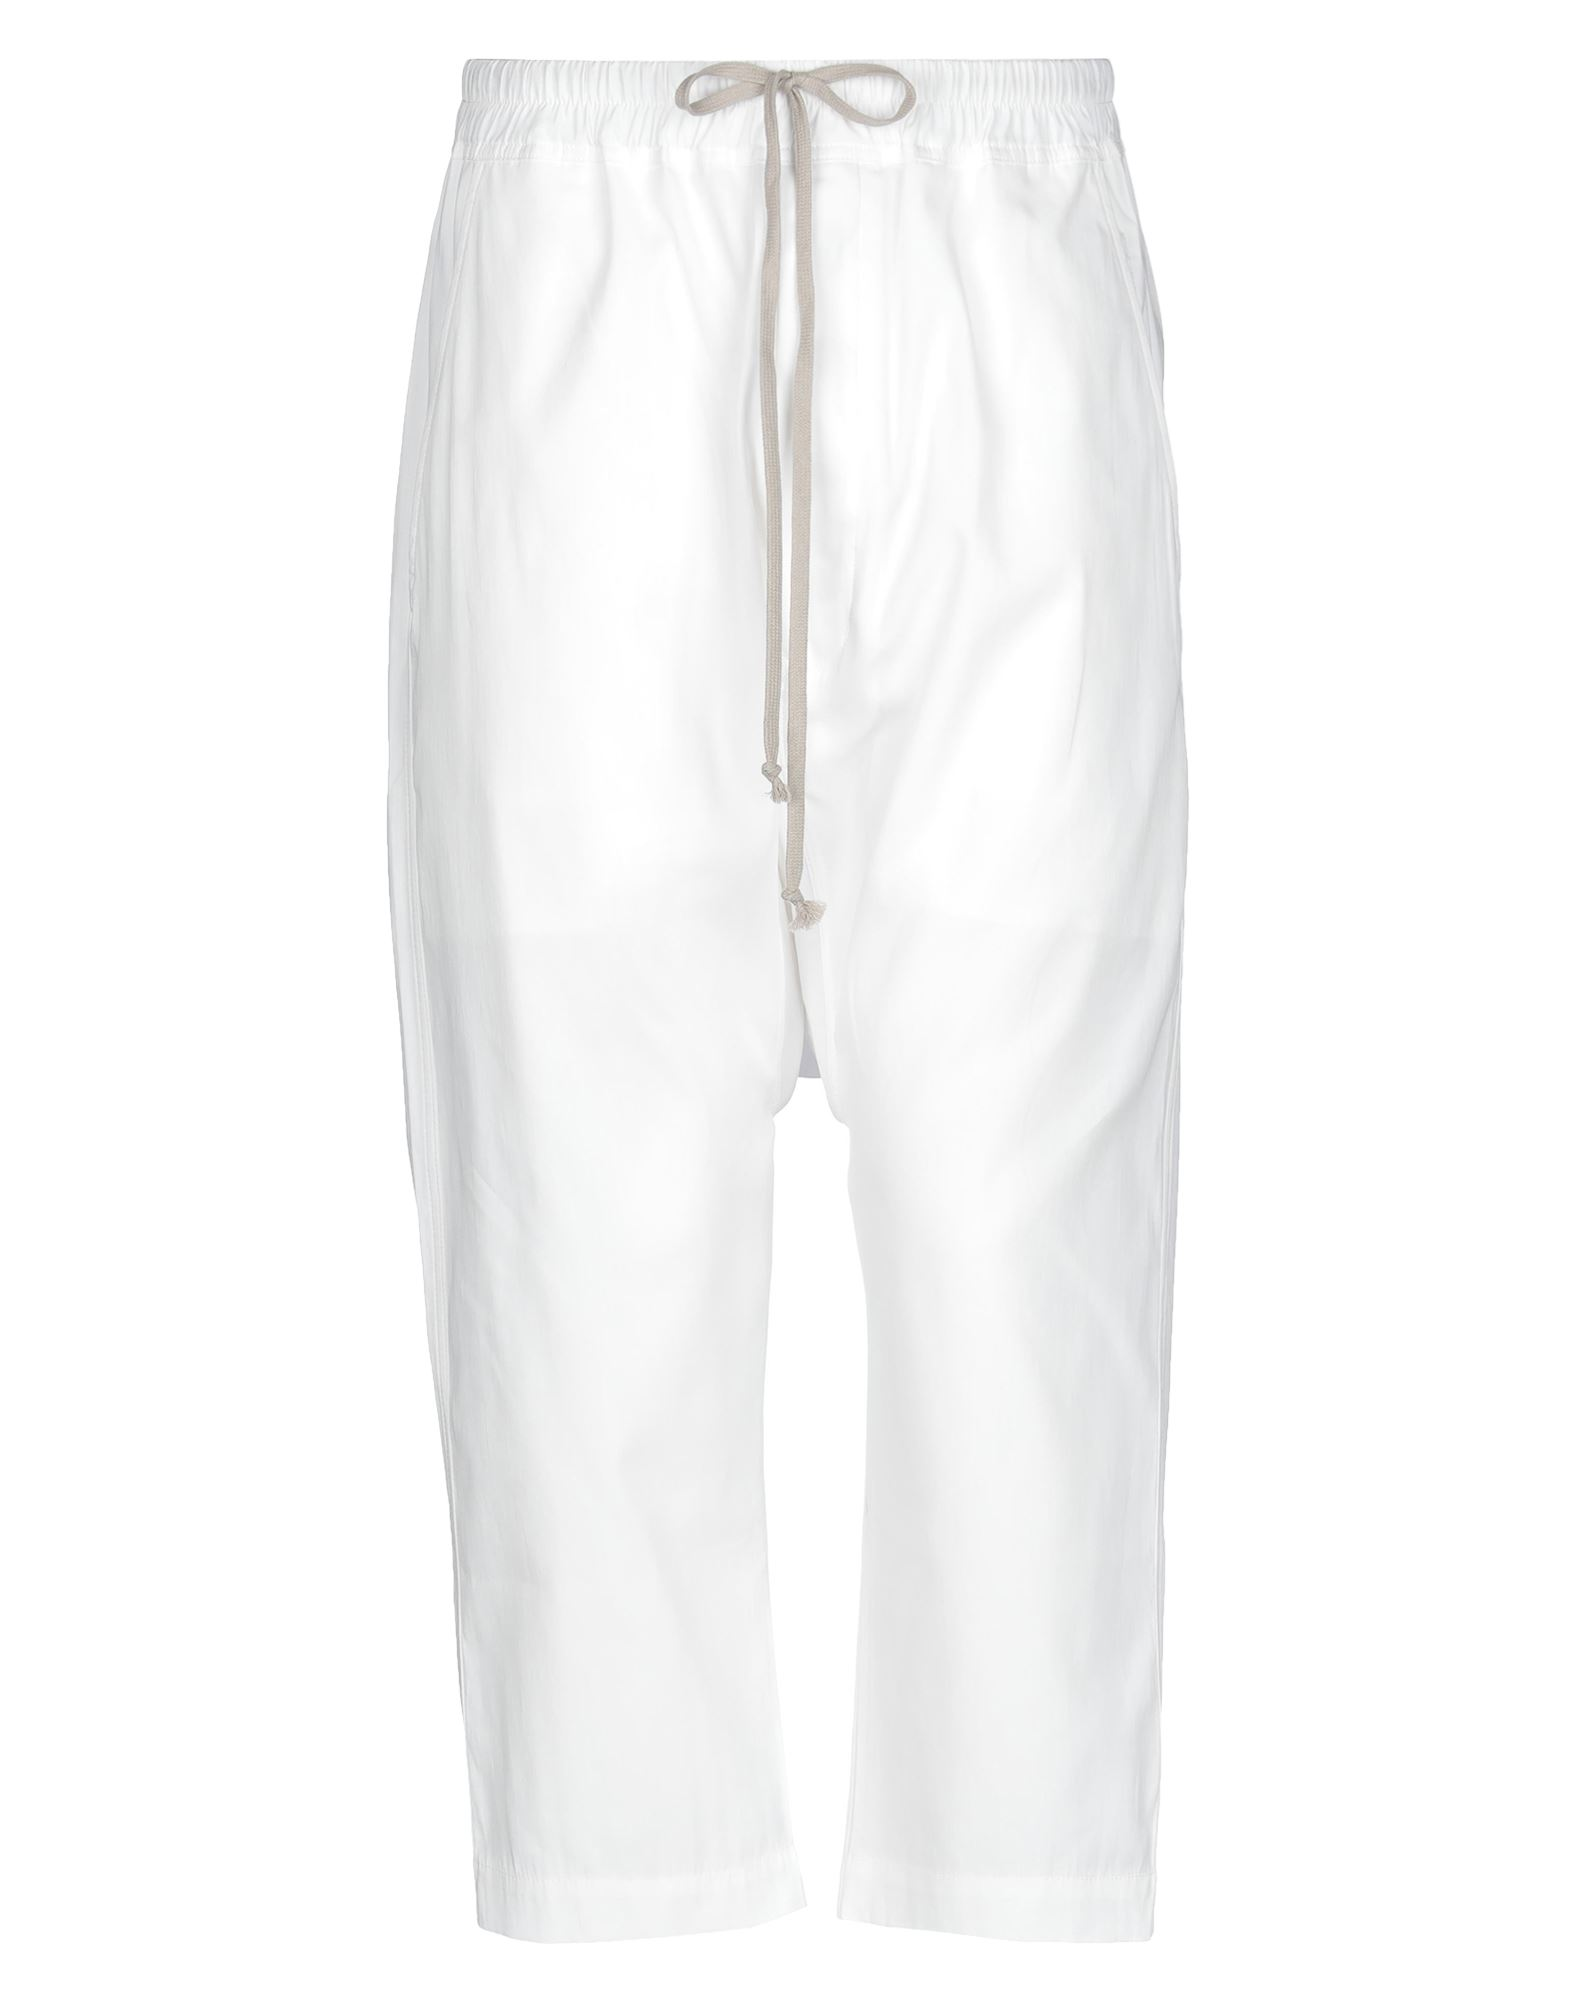 DRKSHDW by RICK OWENS Укороченные брюки drkshdw by rick owens джинсовые брюки капри